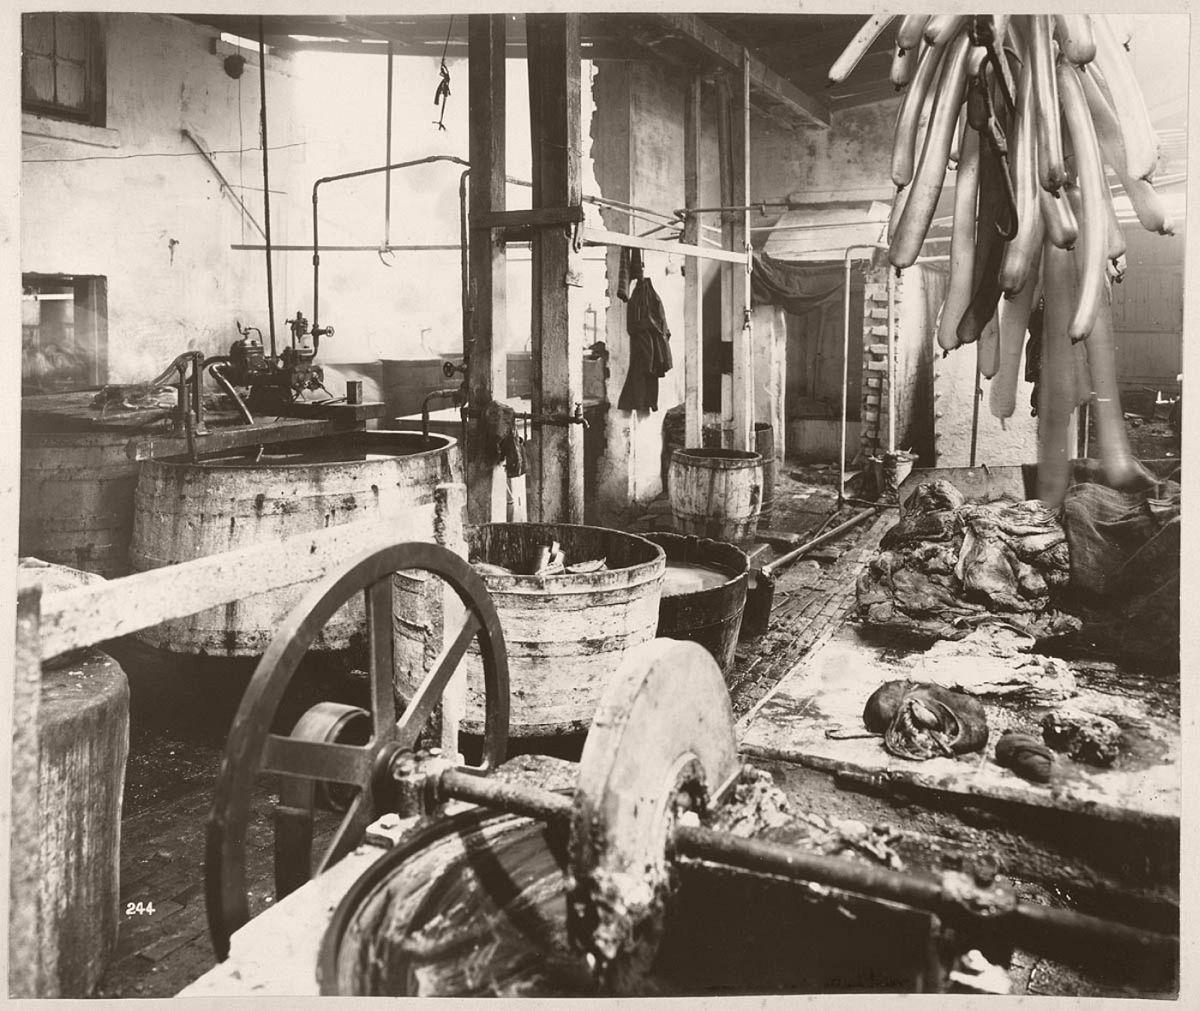 Sutton Forest Butchery. No. 761 George street